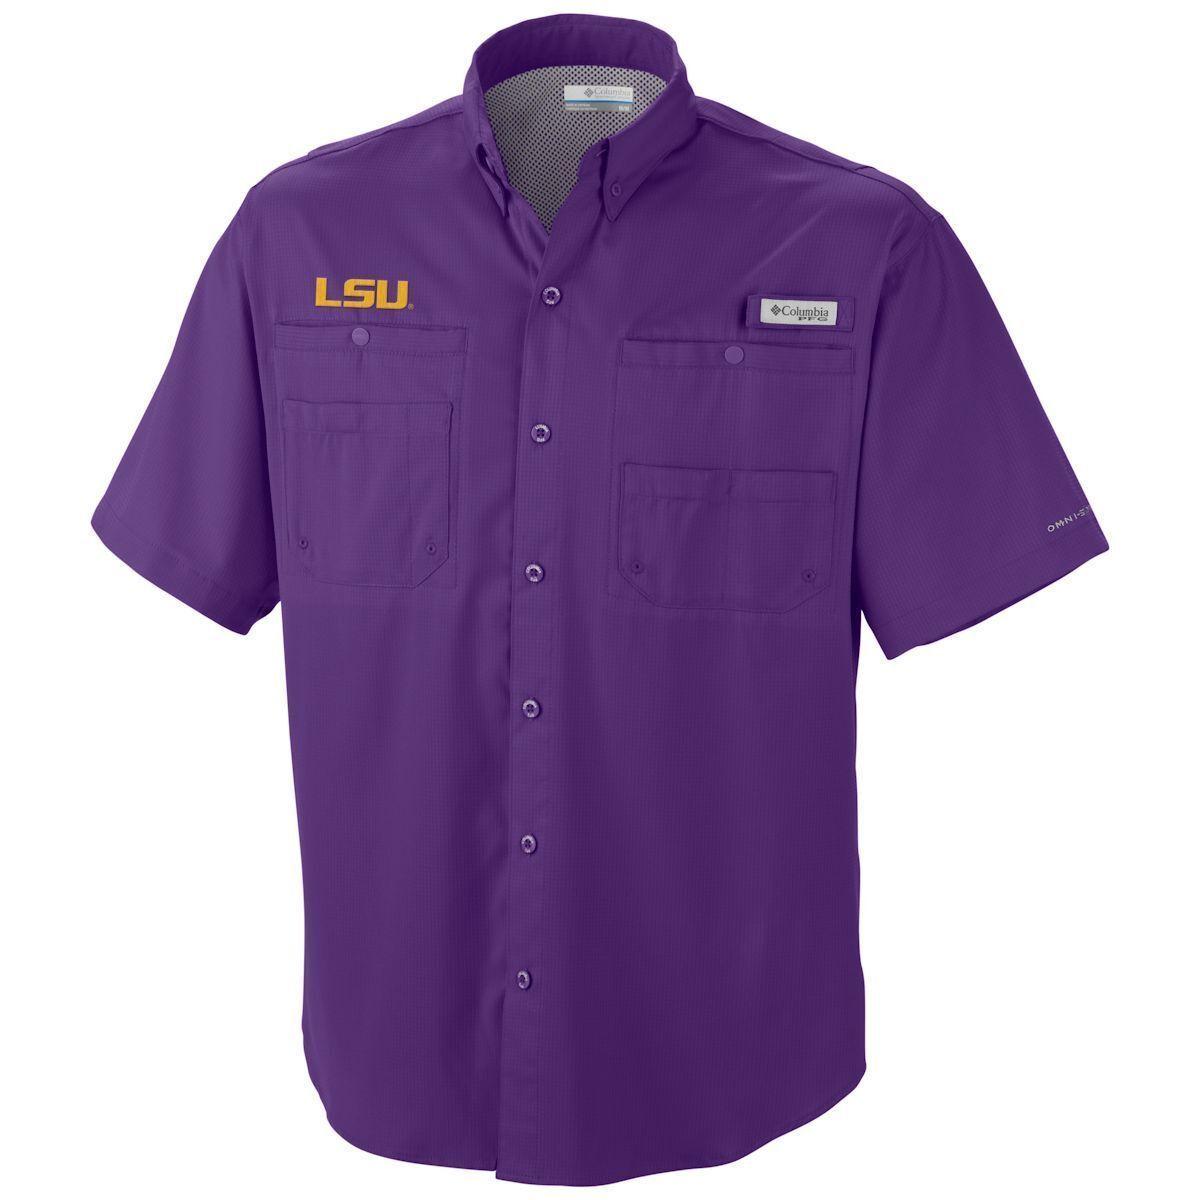 Columbia Men's Tamiami Short Sleeve Shirt - LSU - Omni-Shade - PFG - Size S